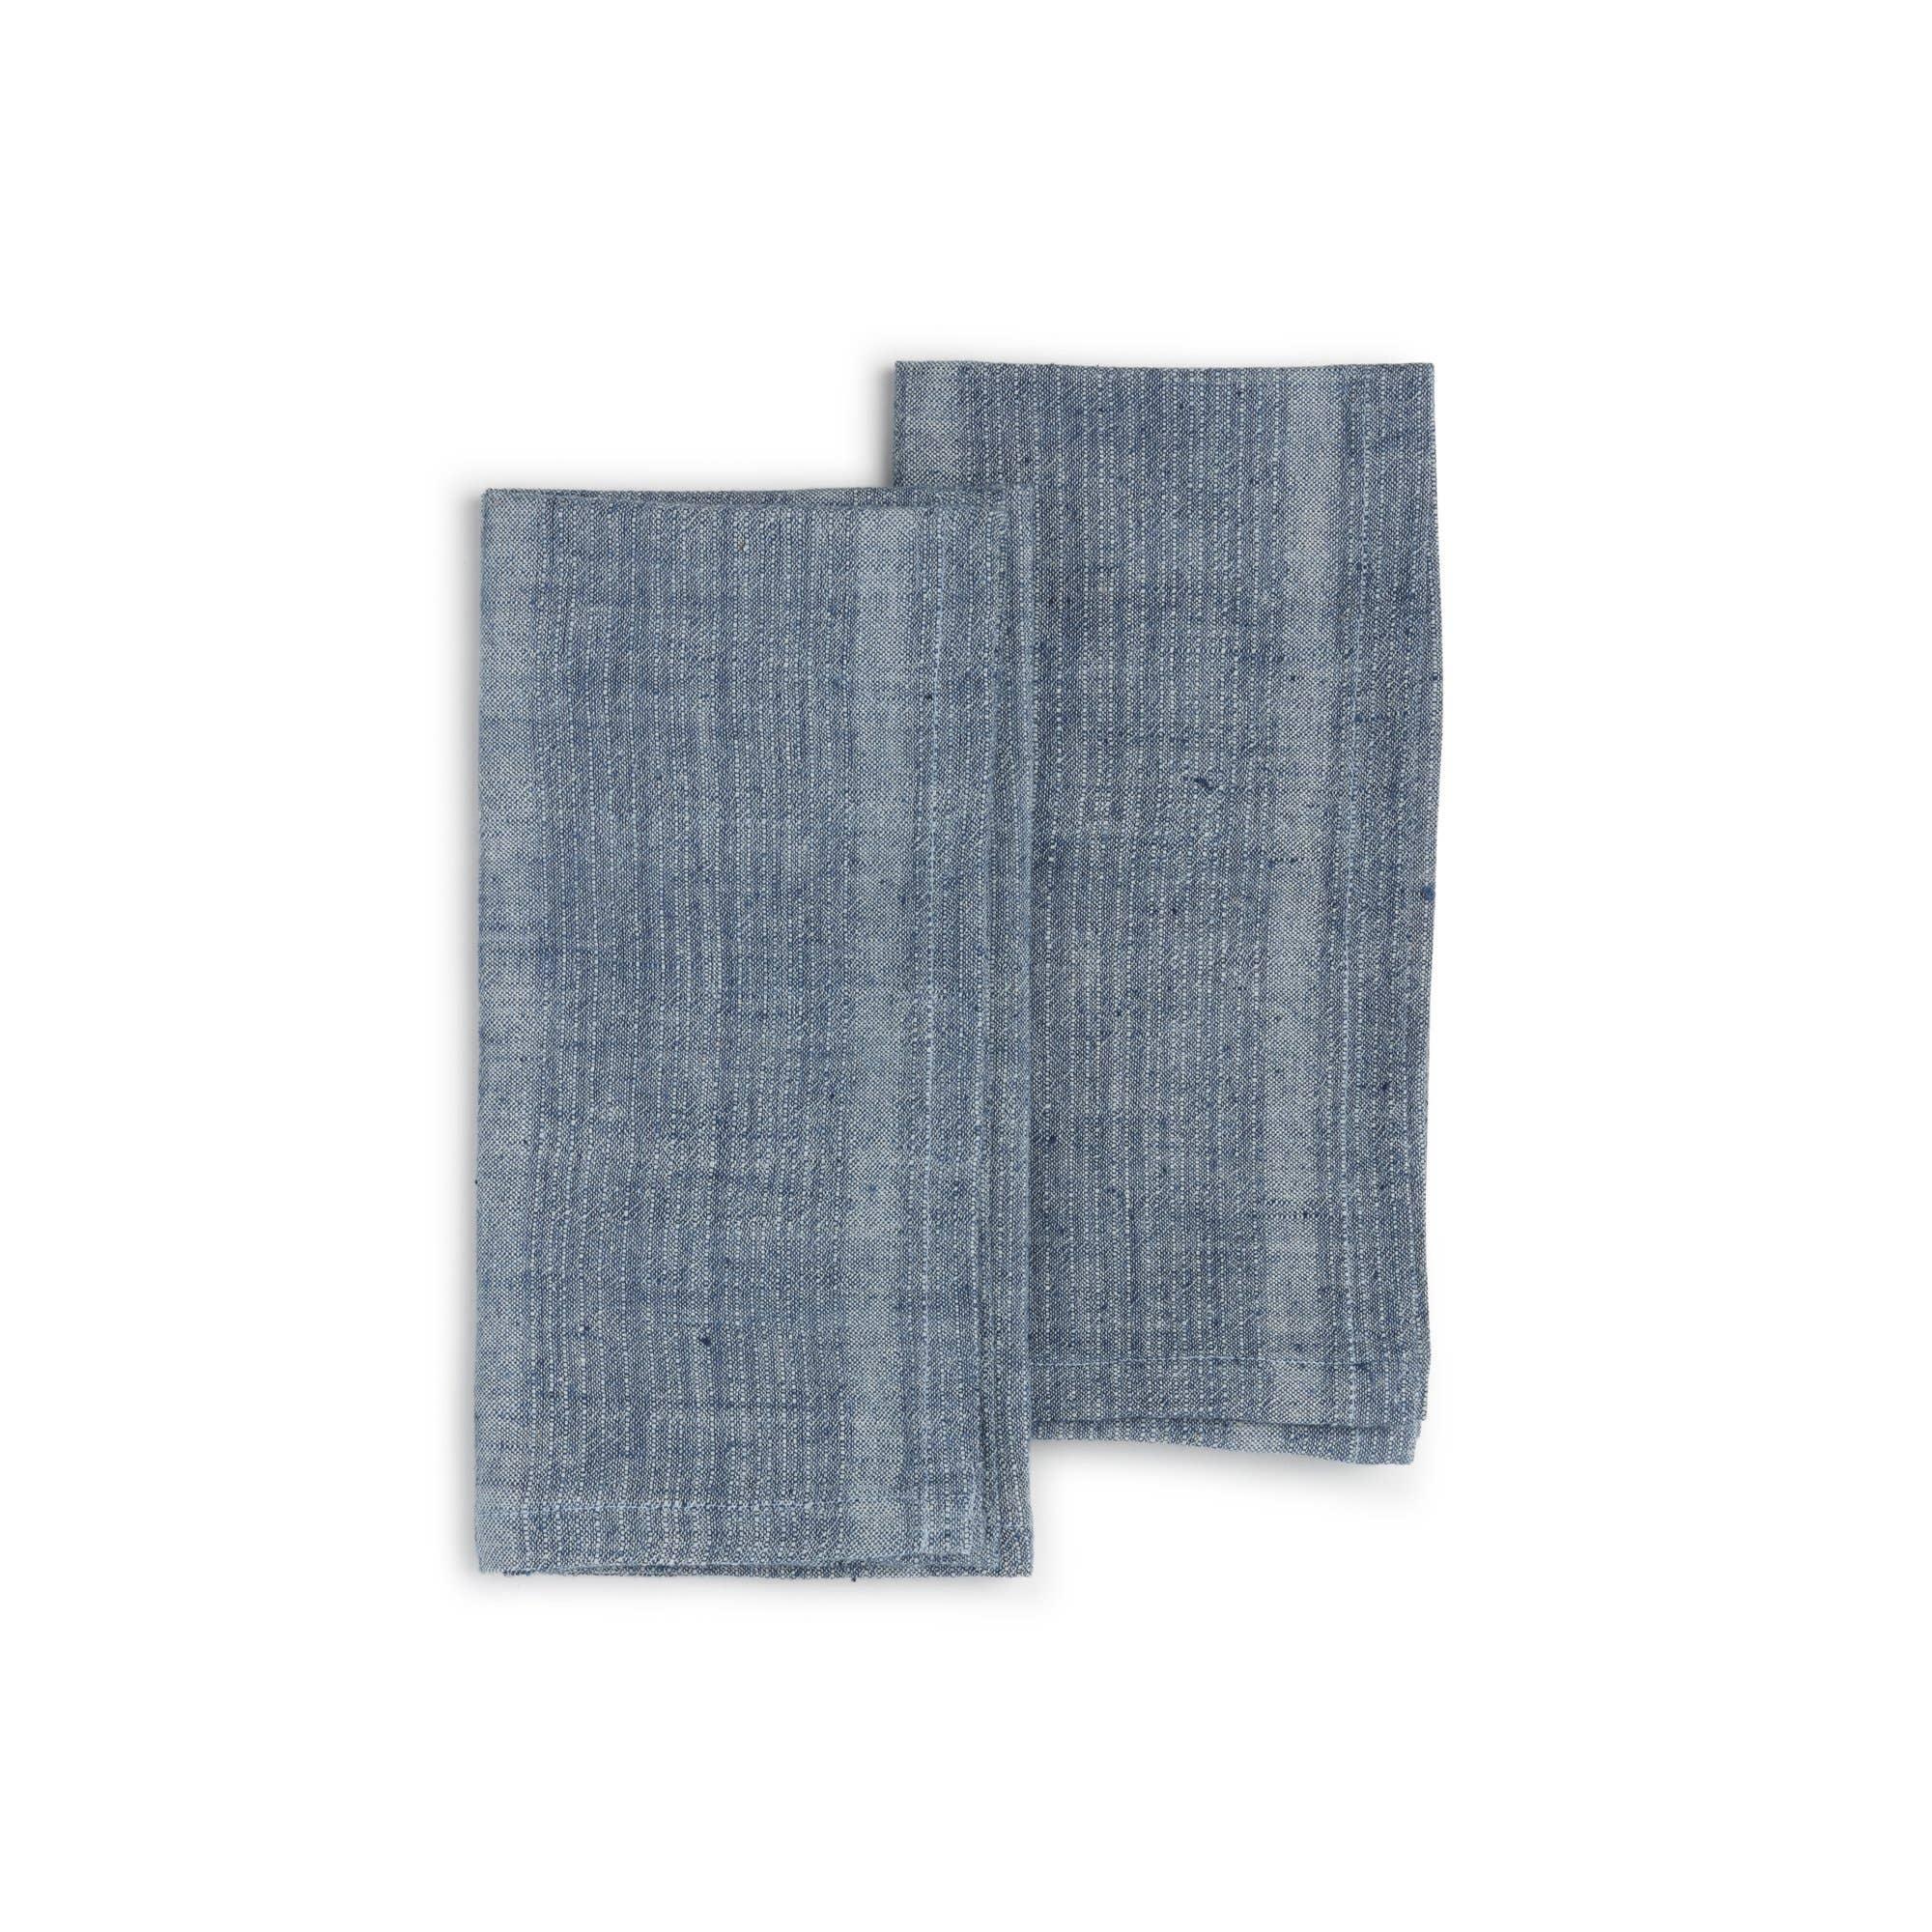 INDIGO SEA Napkin (set of 2), Organic Cotton w/ Natural Dyes | Trada Marketplace